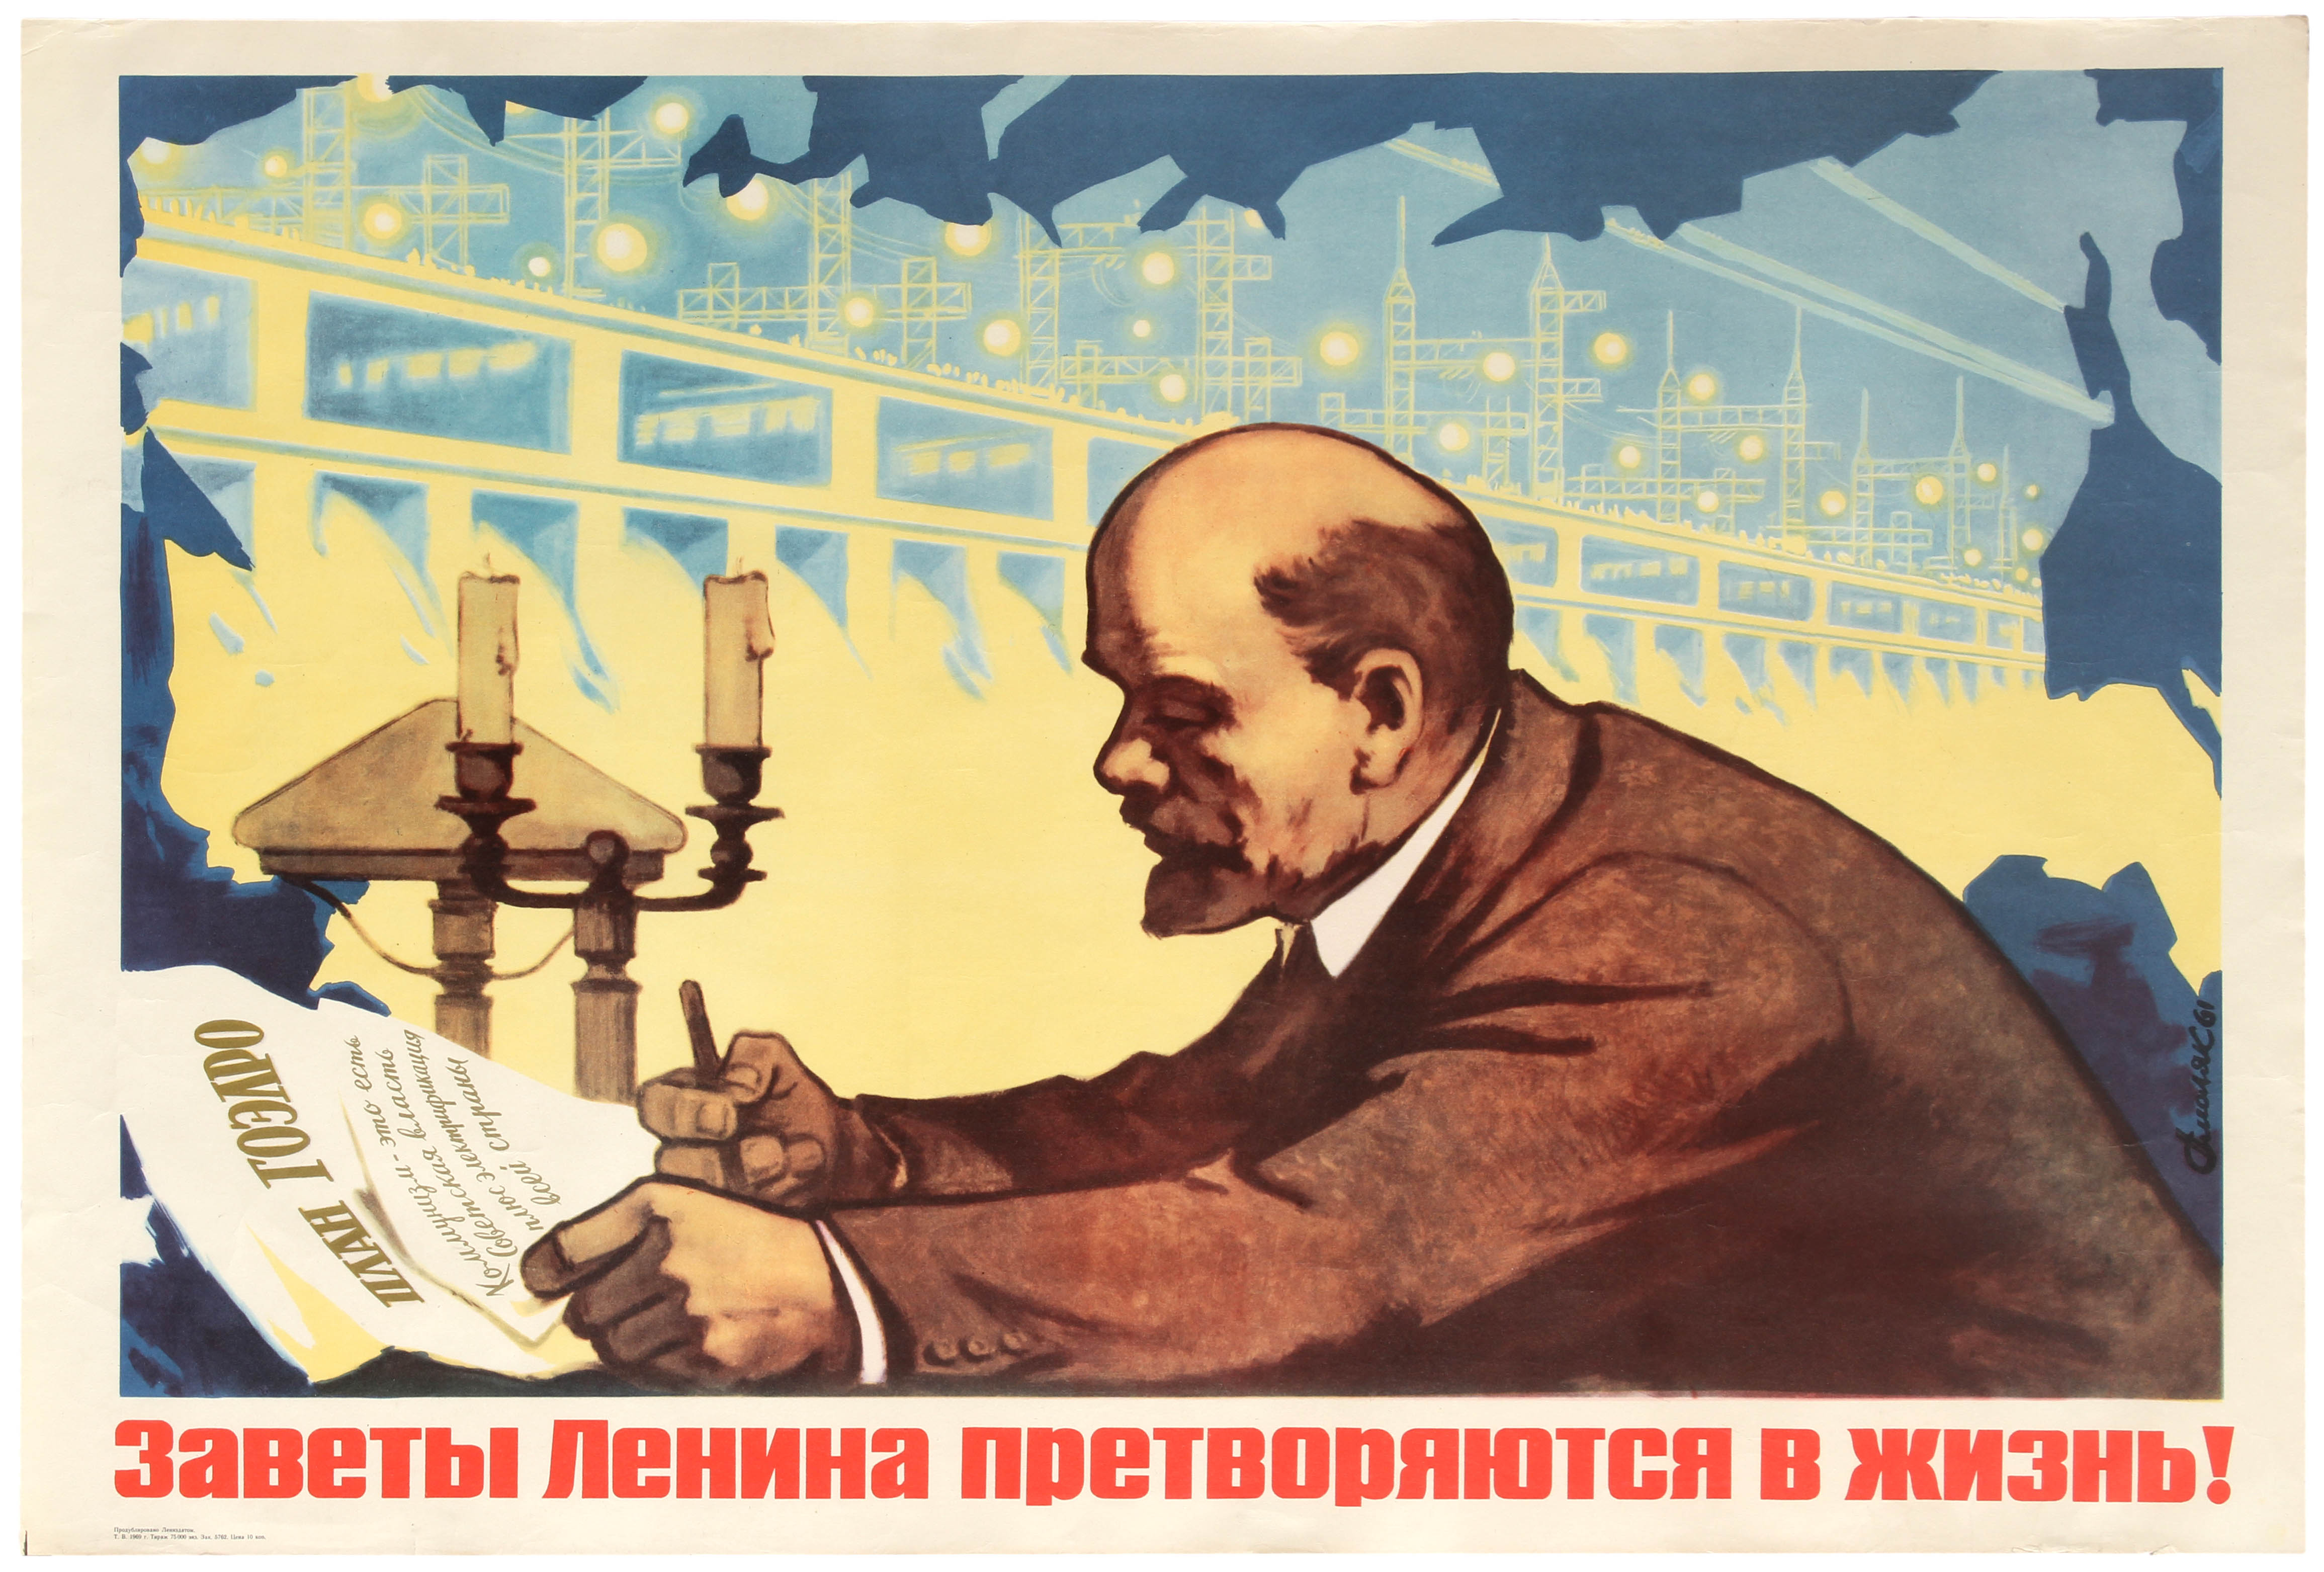 Lot 42 - Propaganda Poster Electrification Lenin Soviet Union